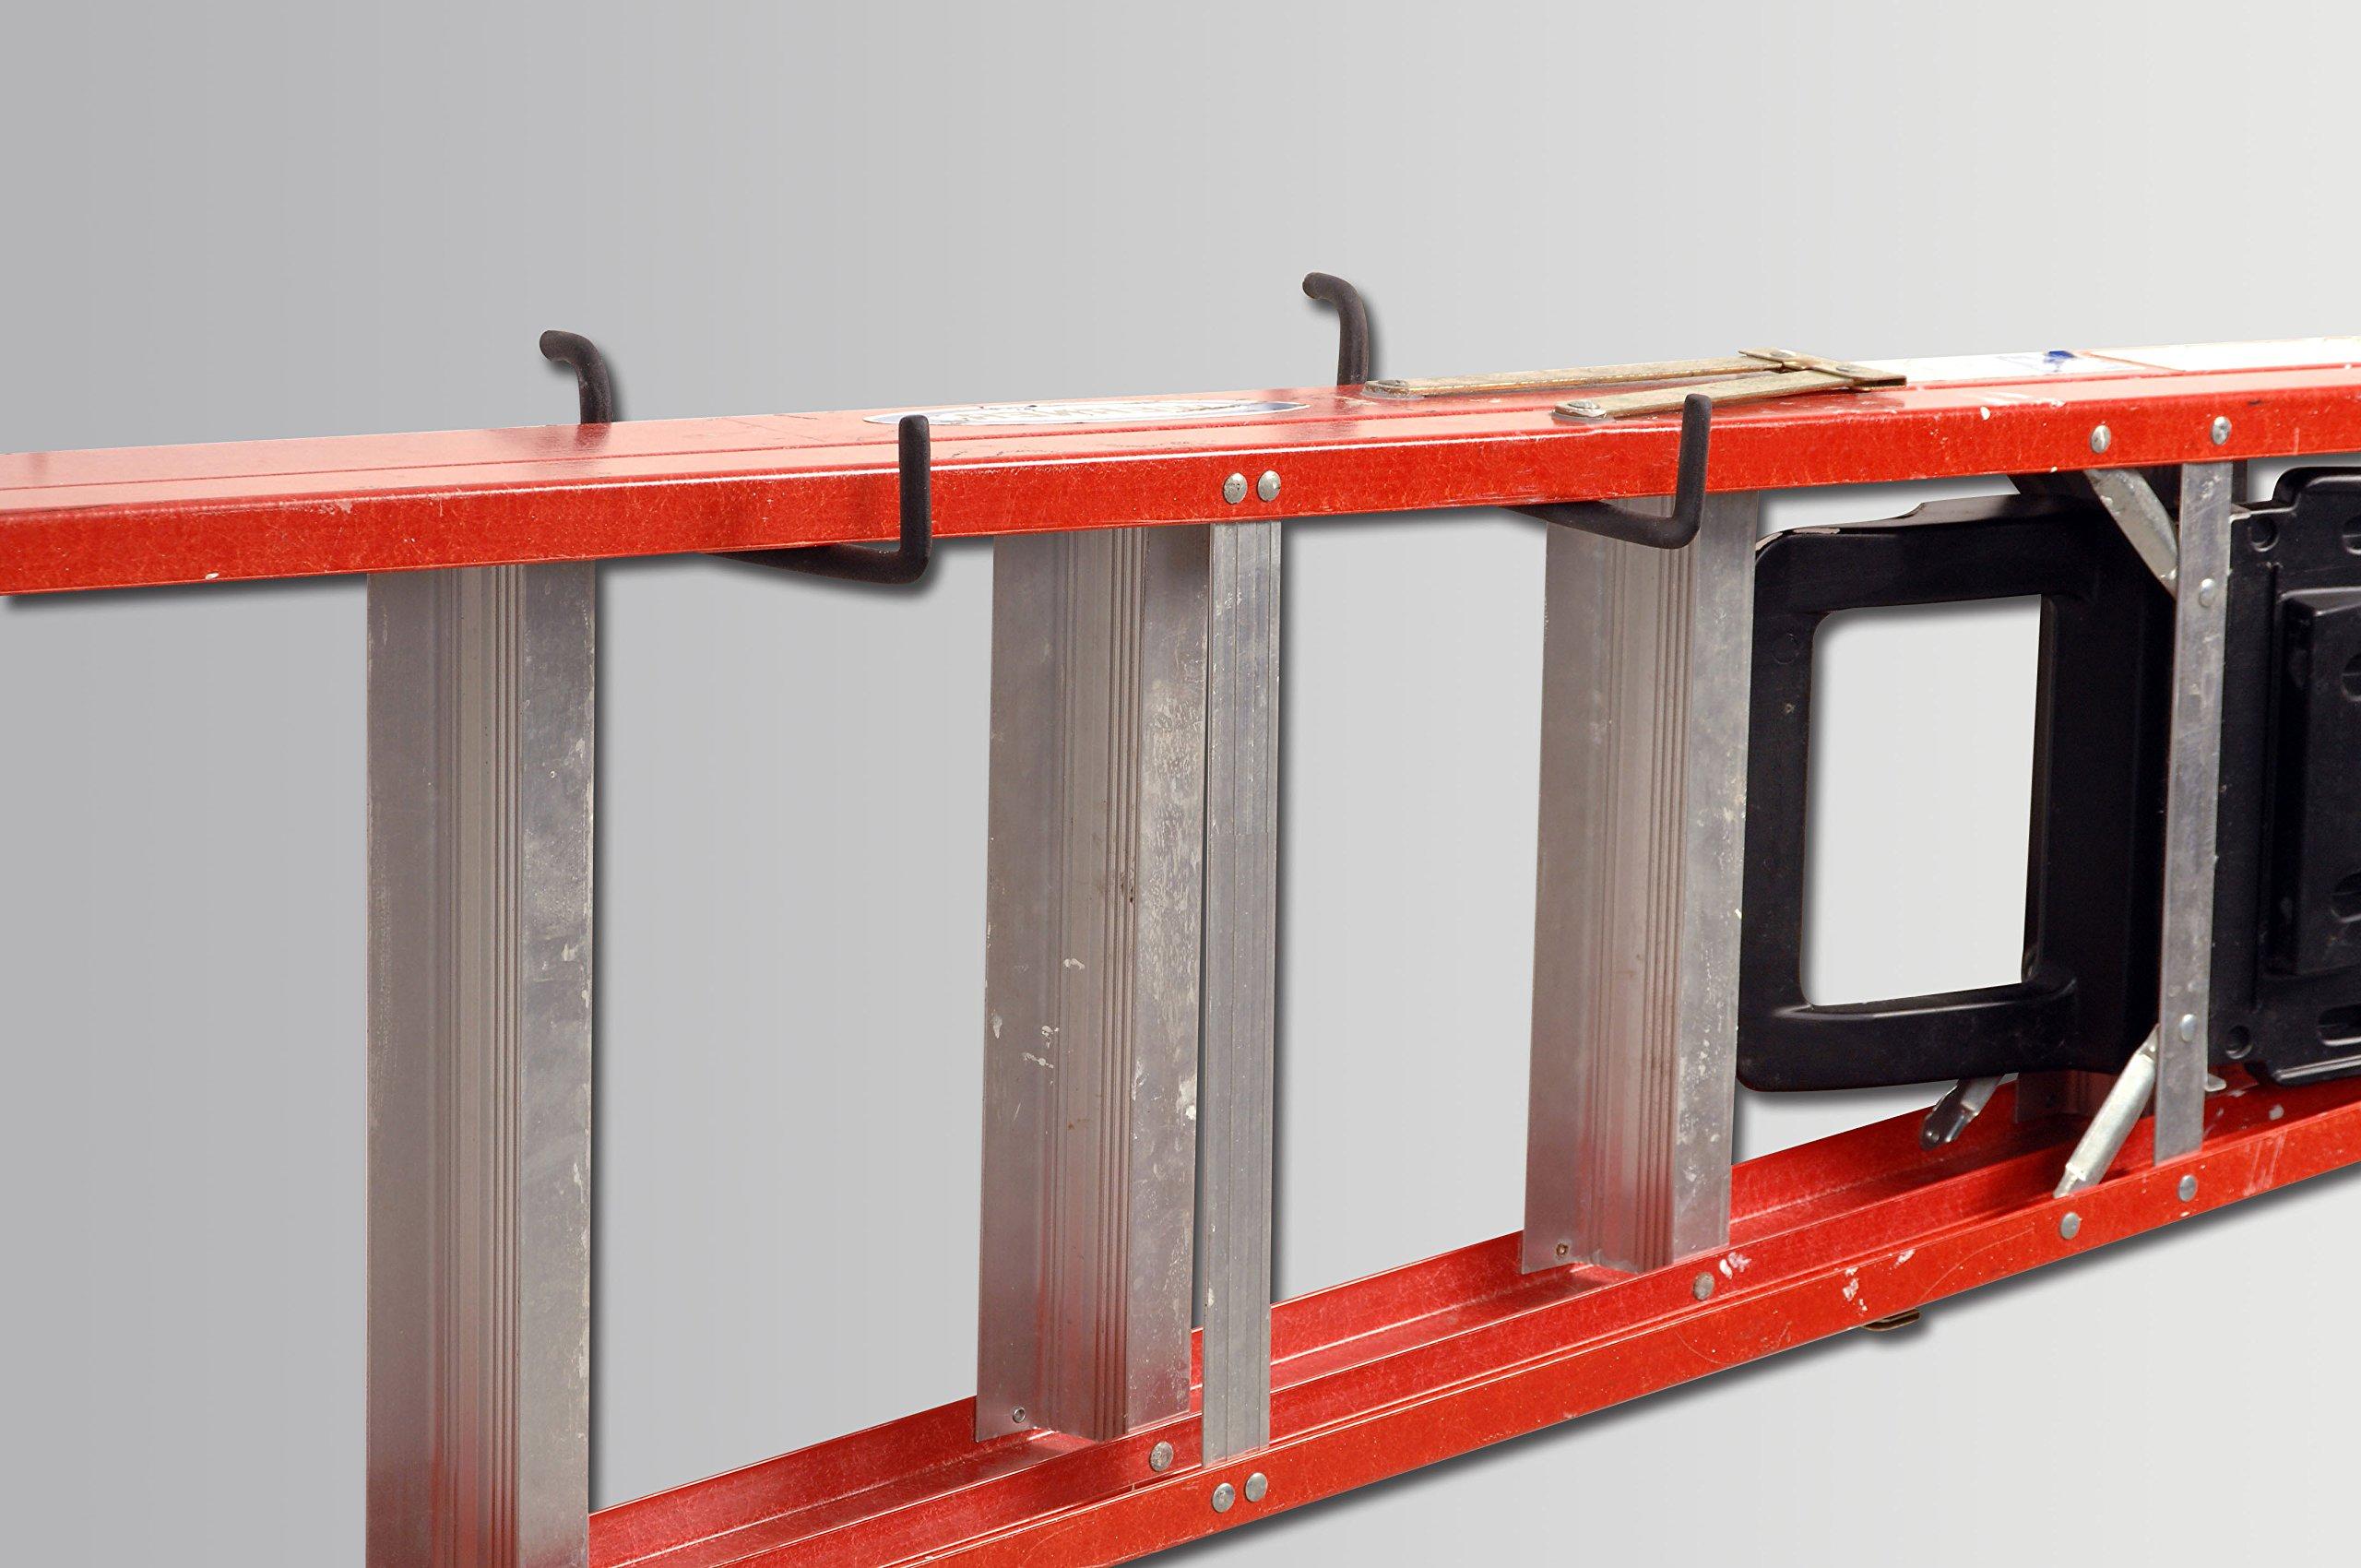 Dorman Hardware 4-9748 Heavy Duty Ladder Hooks, 2-Pack by Dorman Hardware (Image #2)